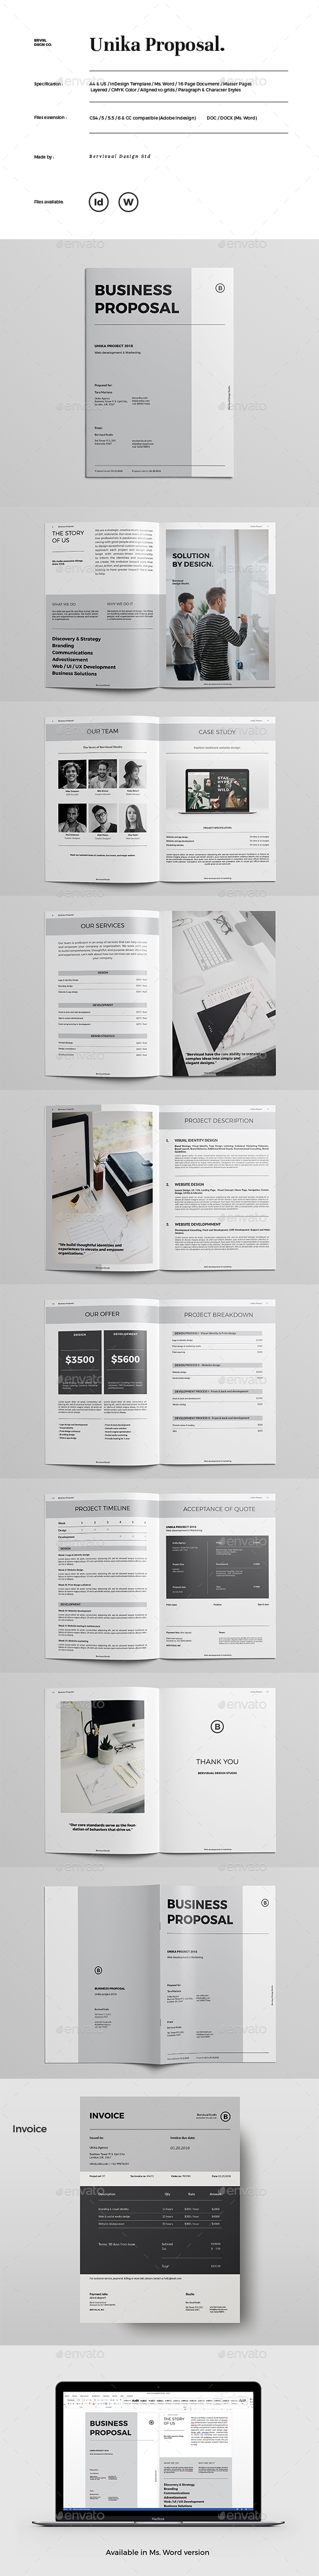 GraphicRiver Unika Proposal Template 21127449